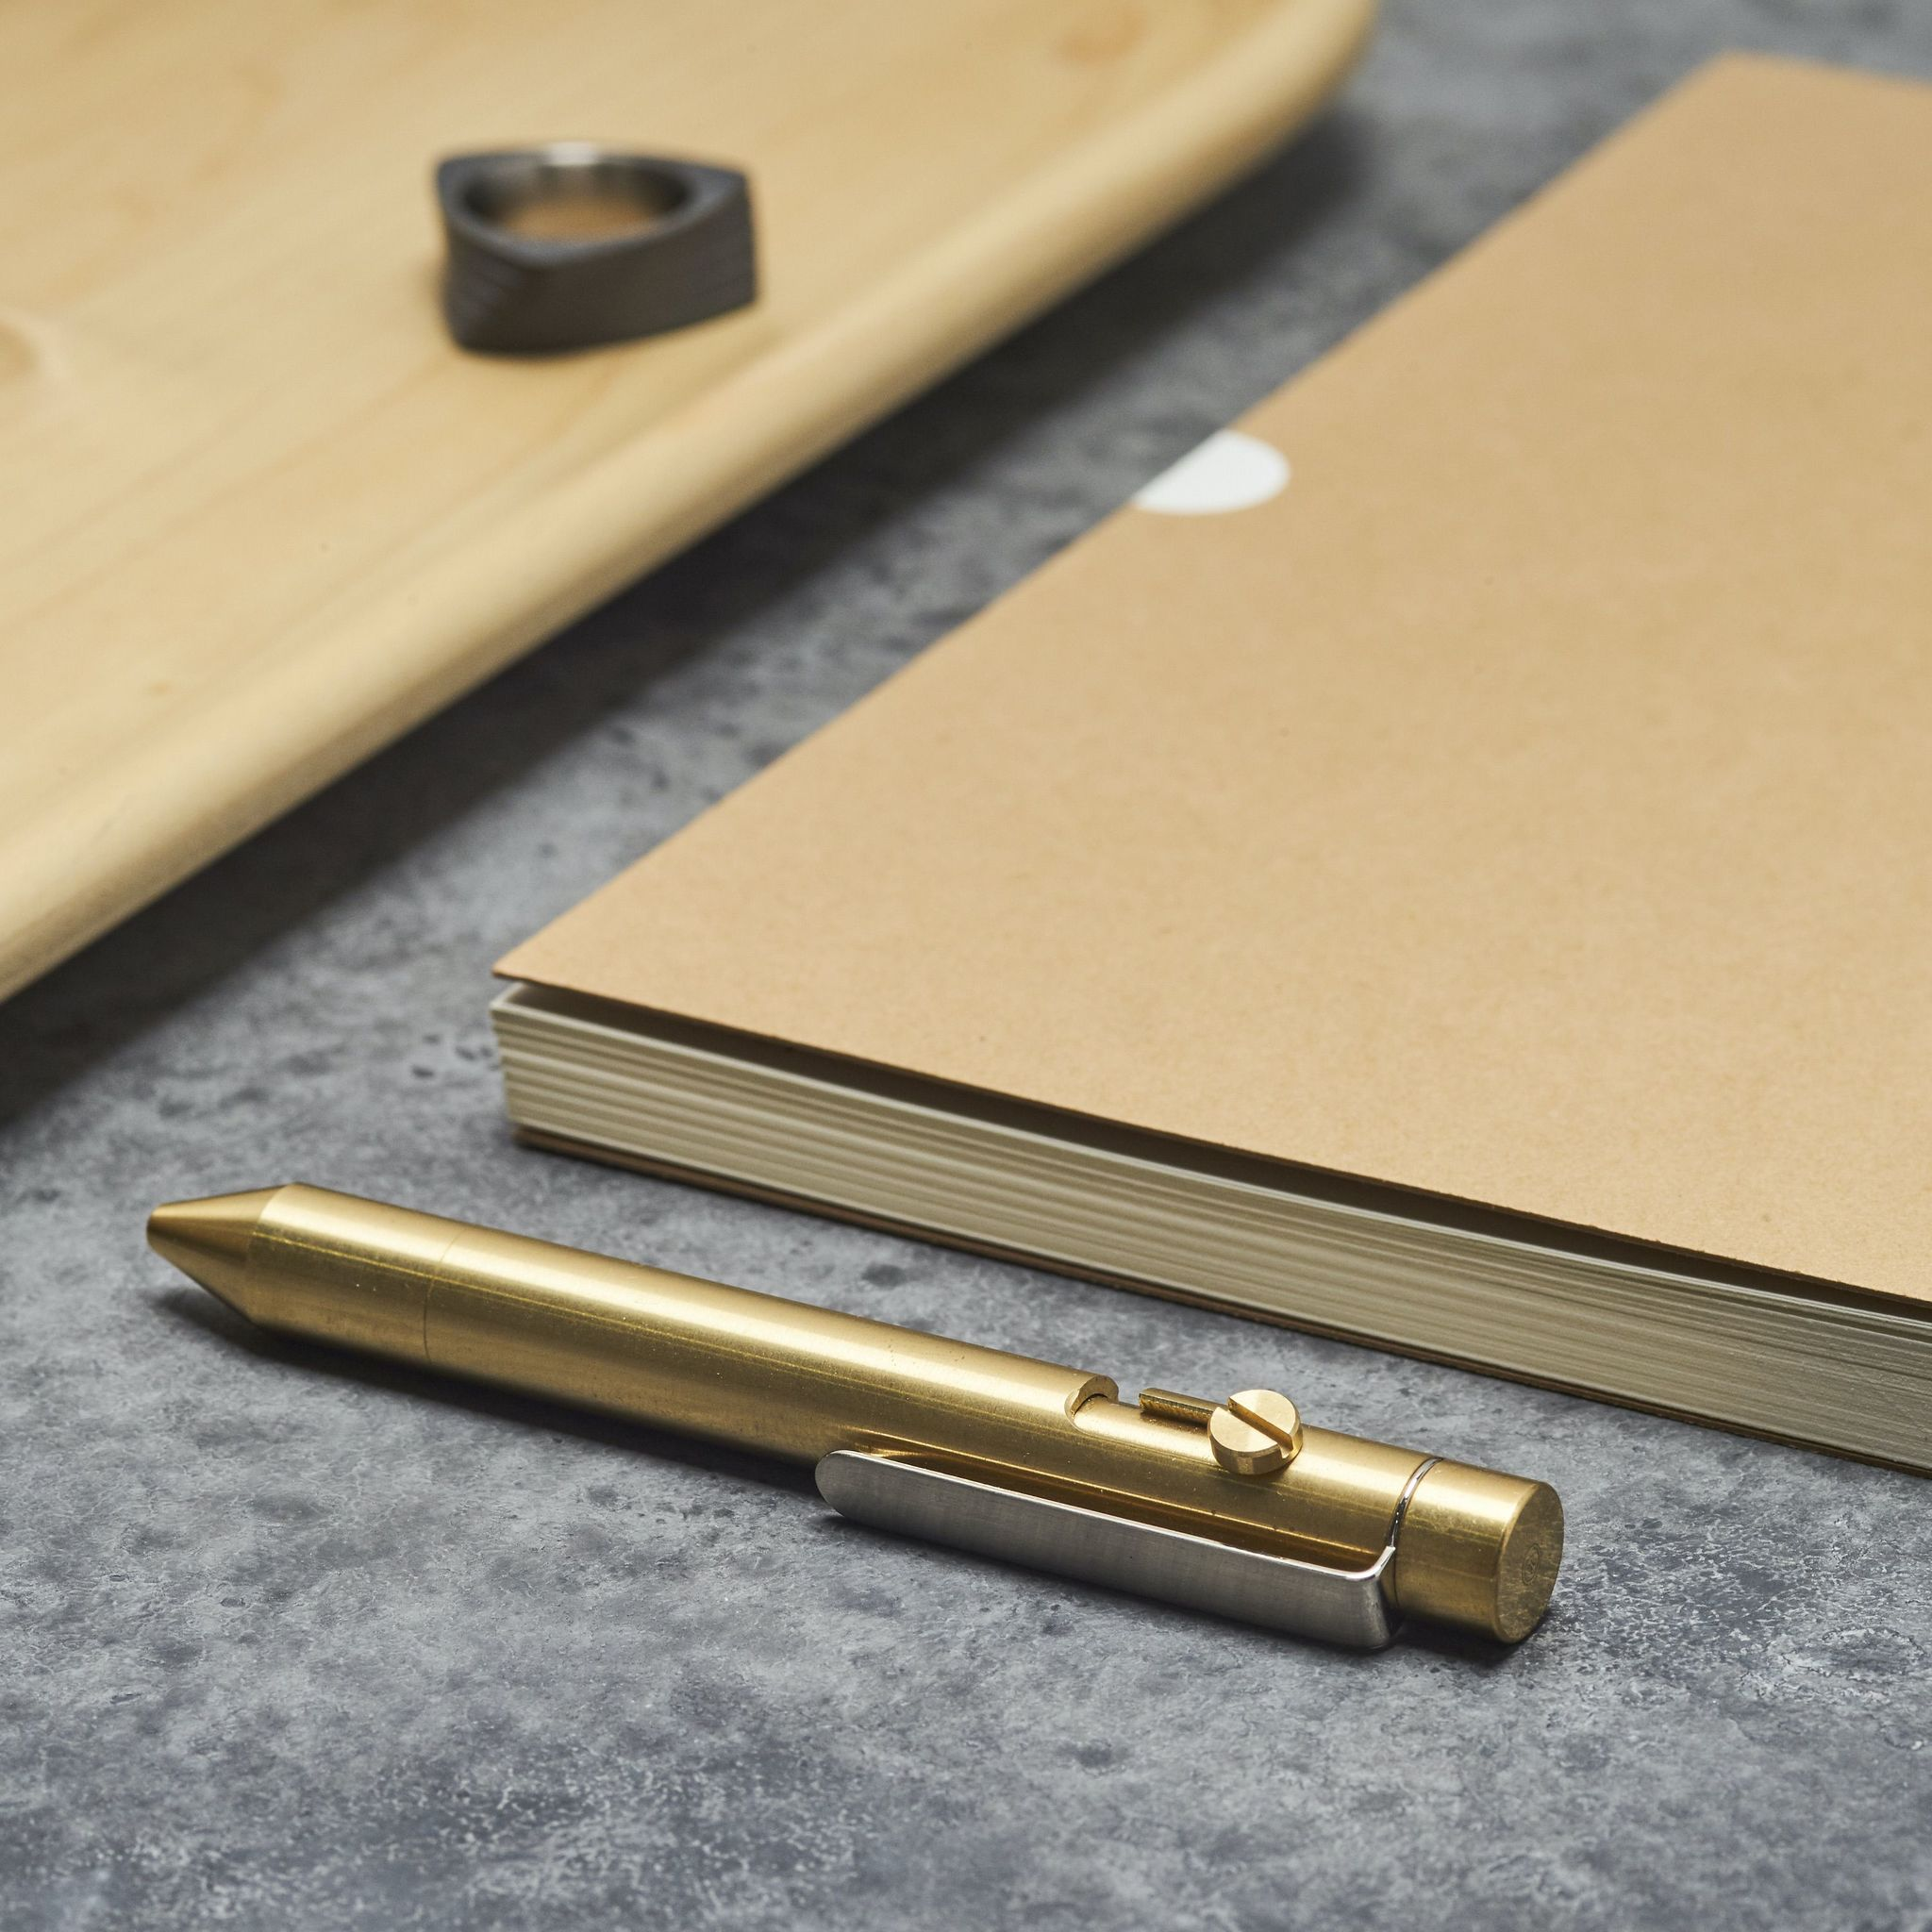 Inventery Bolt Action Pen Brass